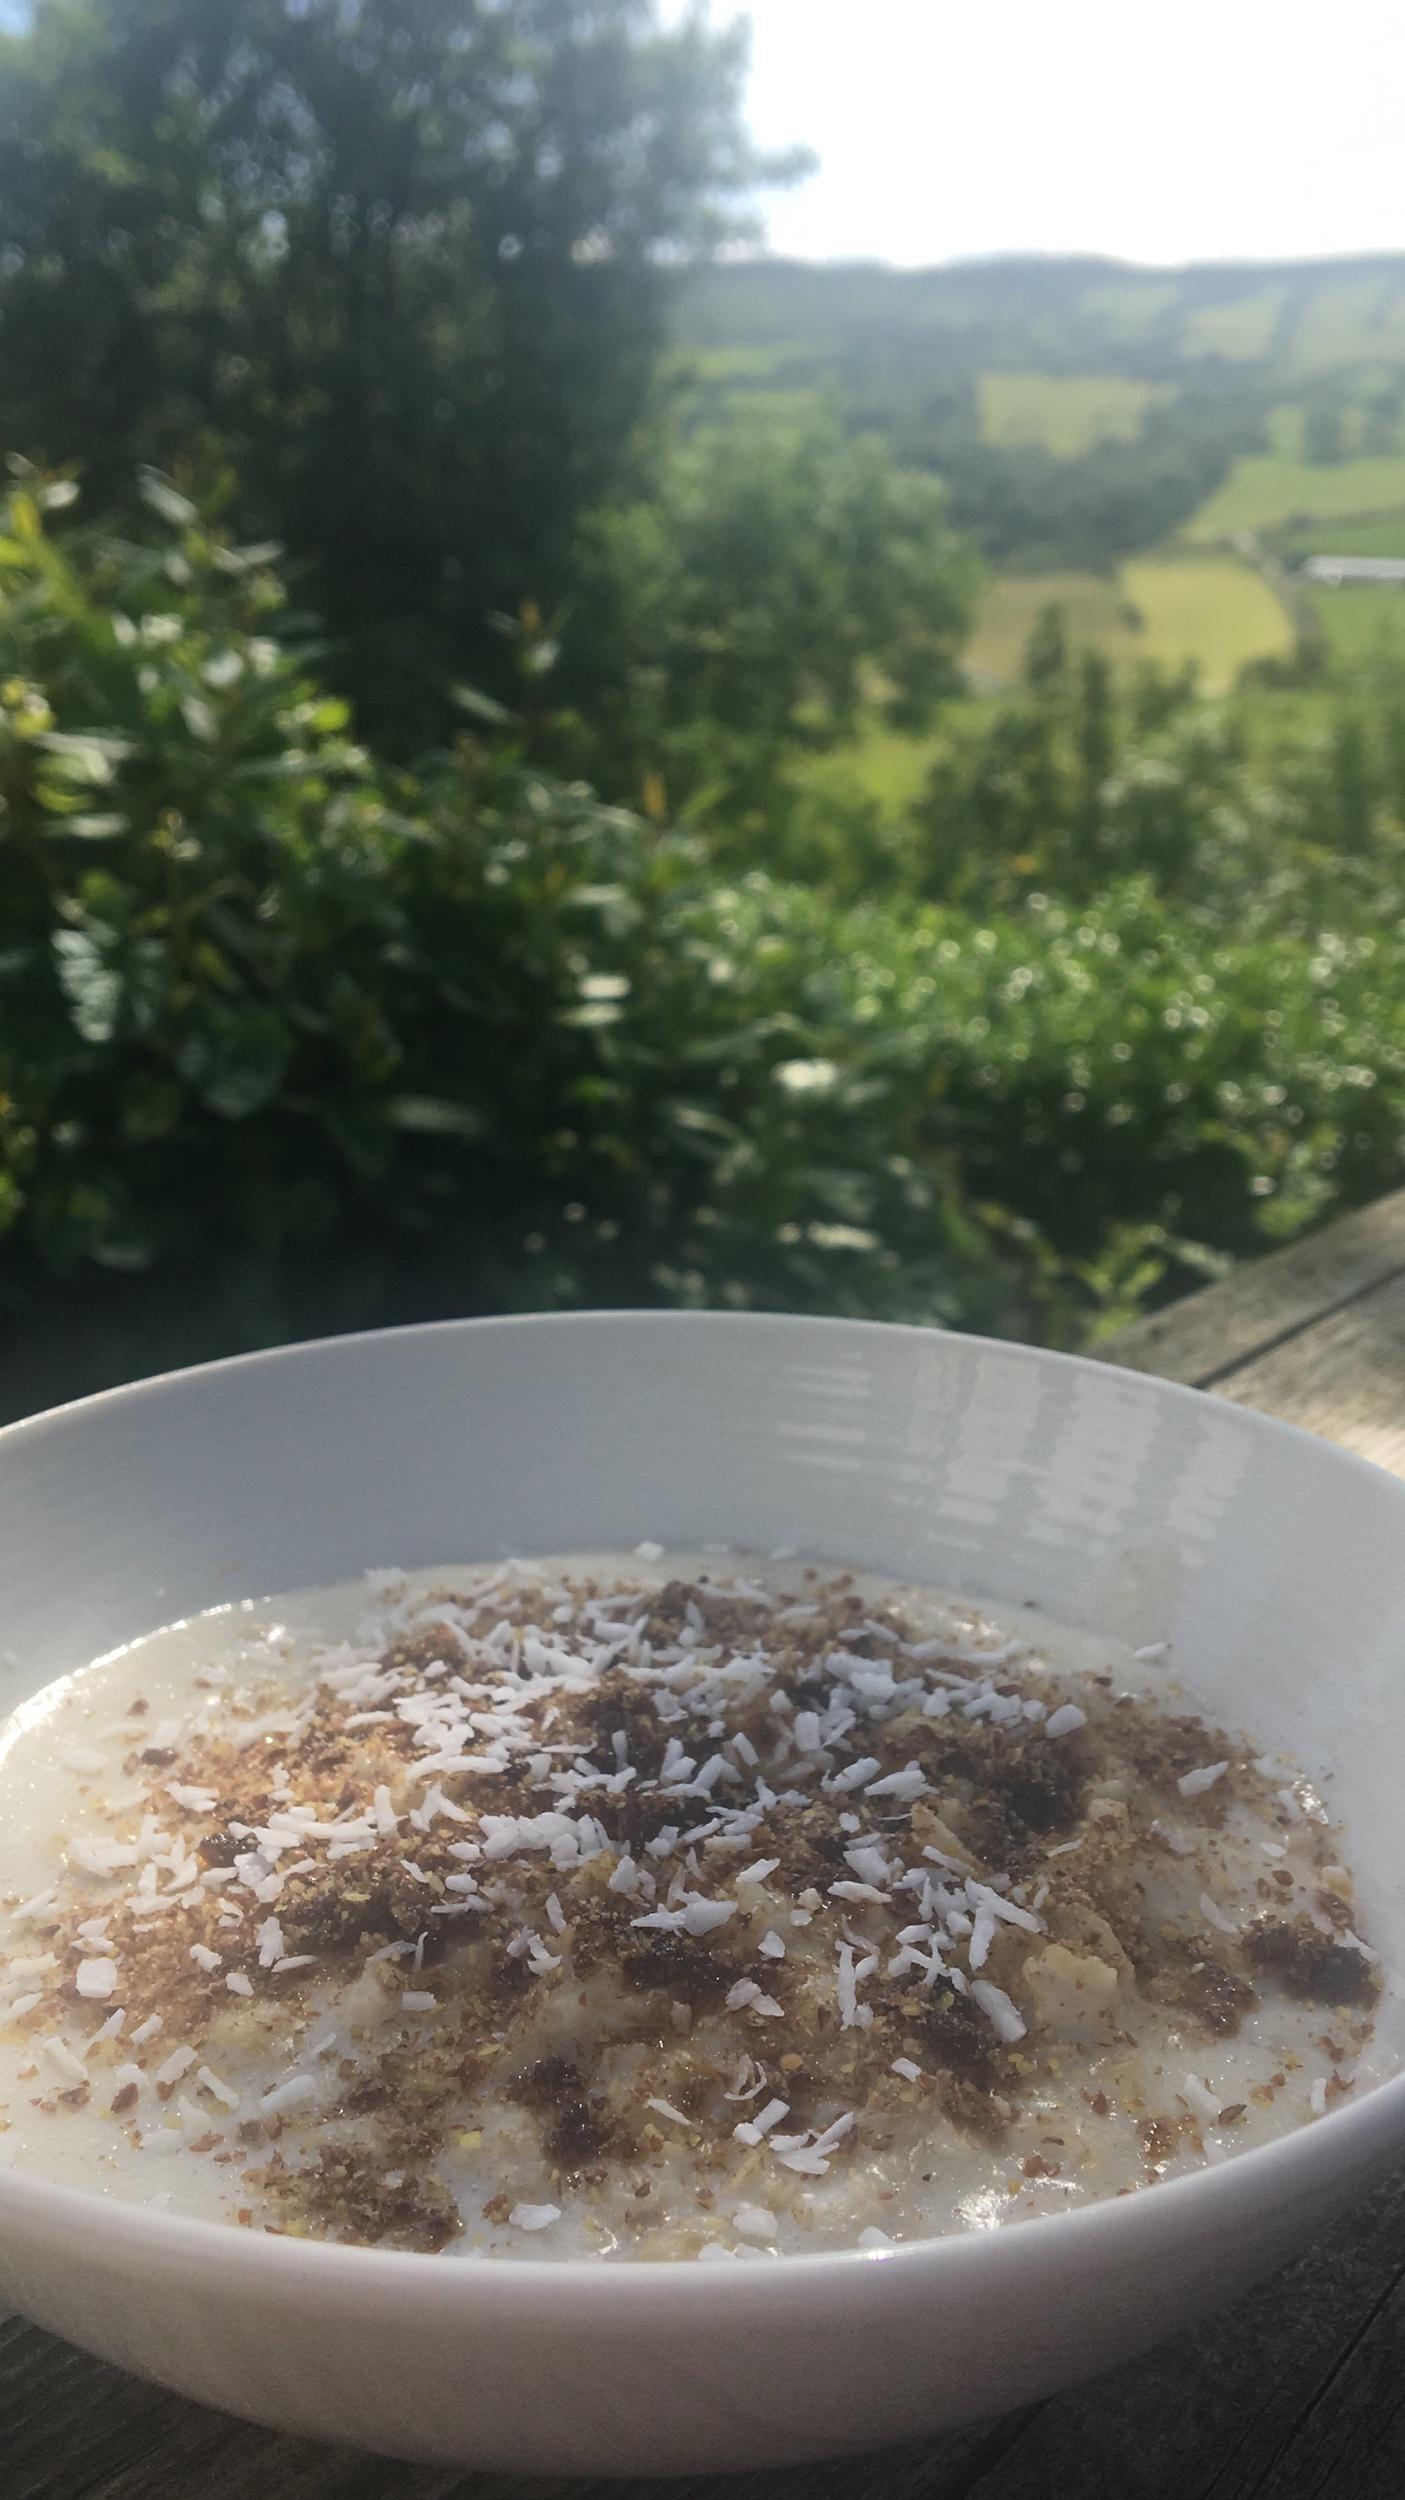 Porridge on the deck in the sunshine. 🥣 🌞